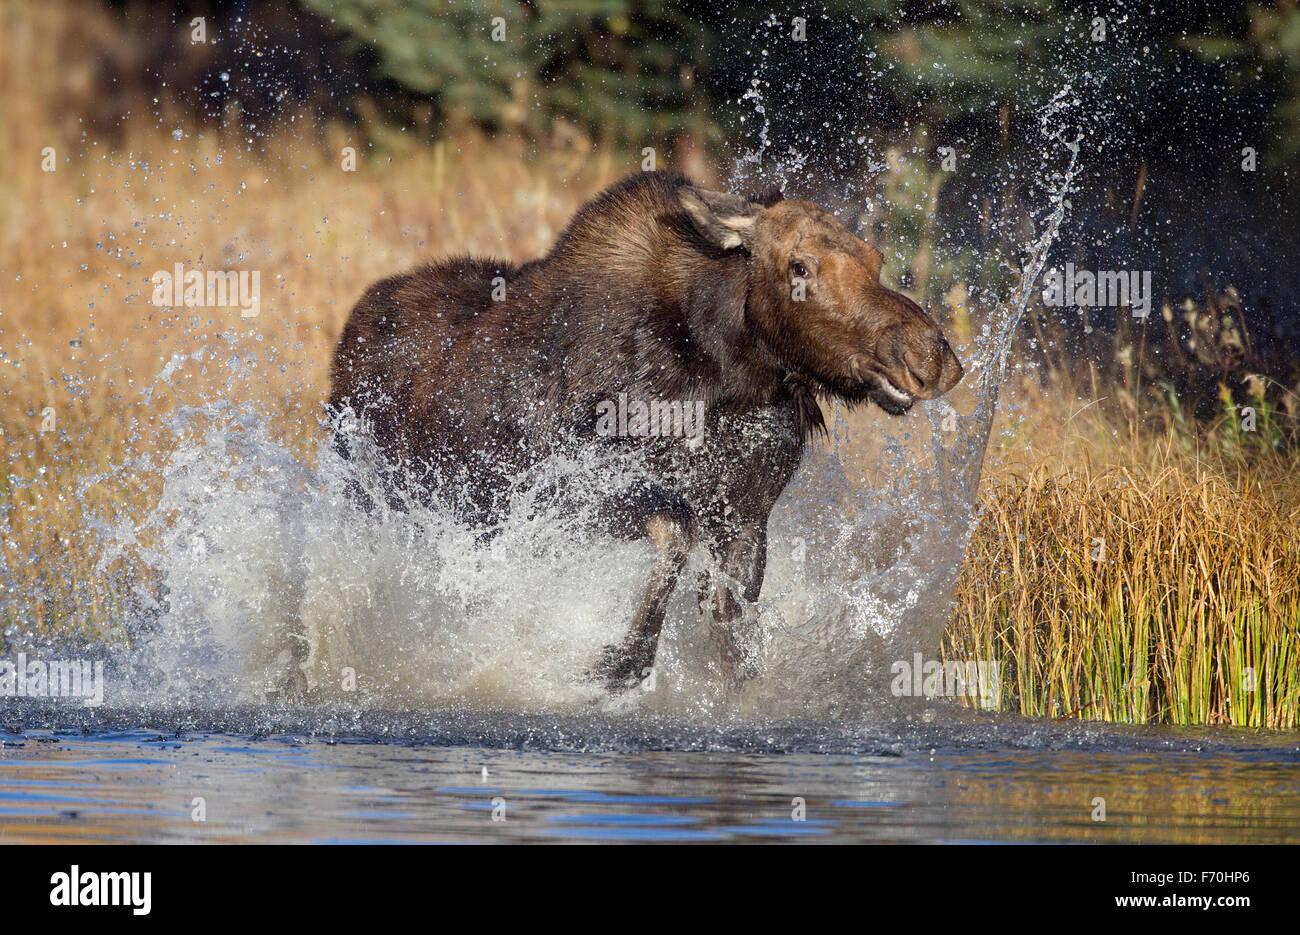 Moose Cow - Stock Image